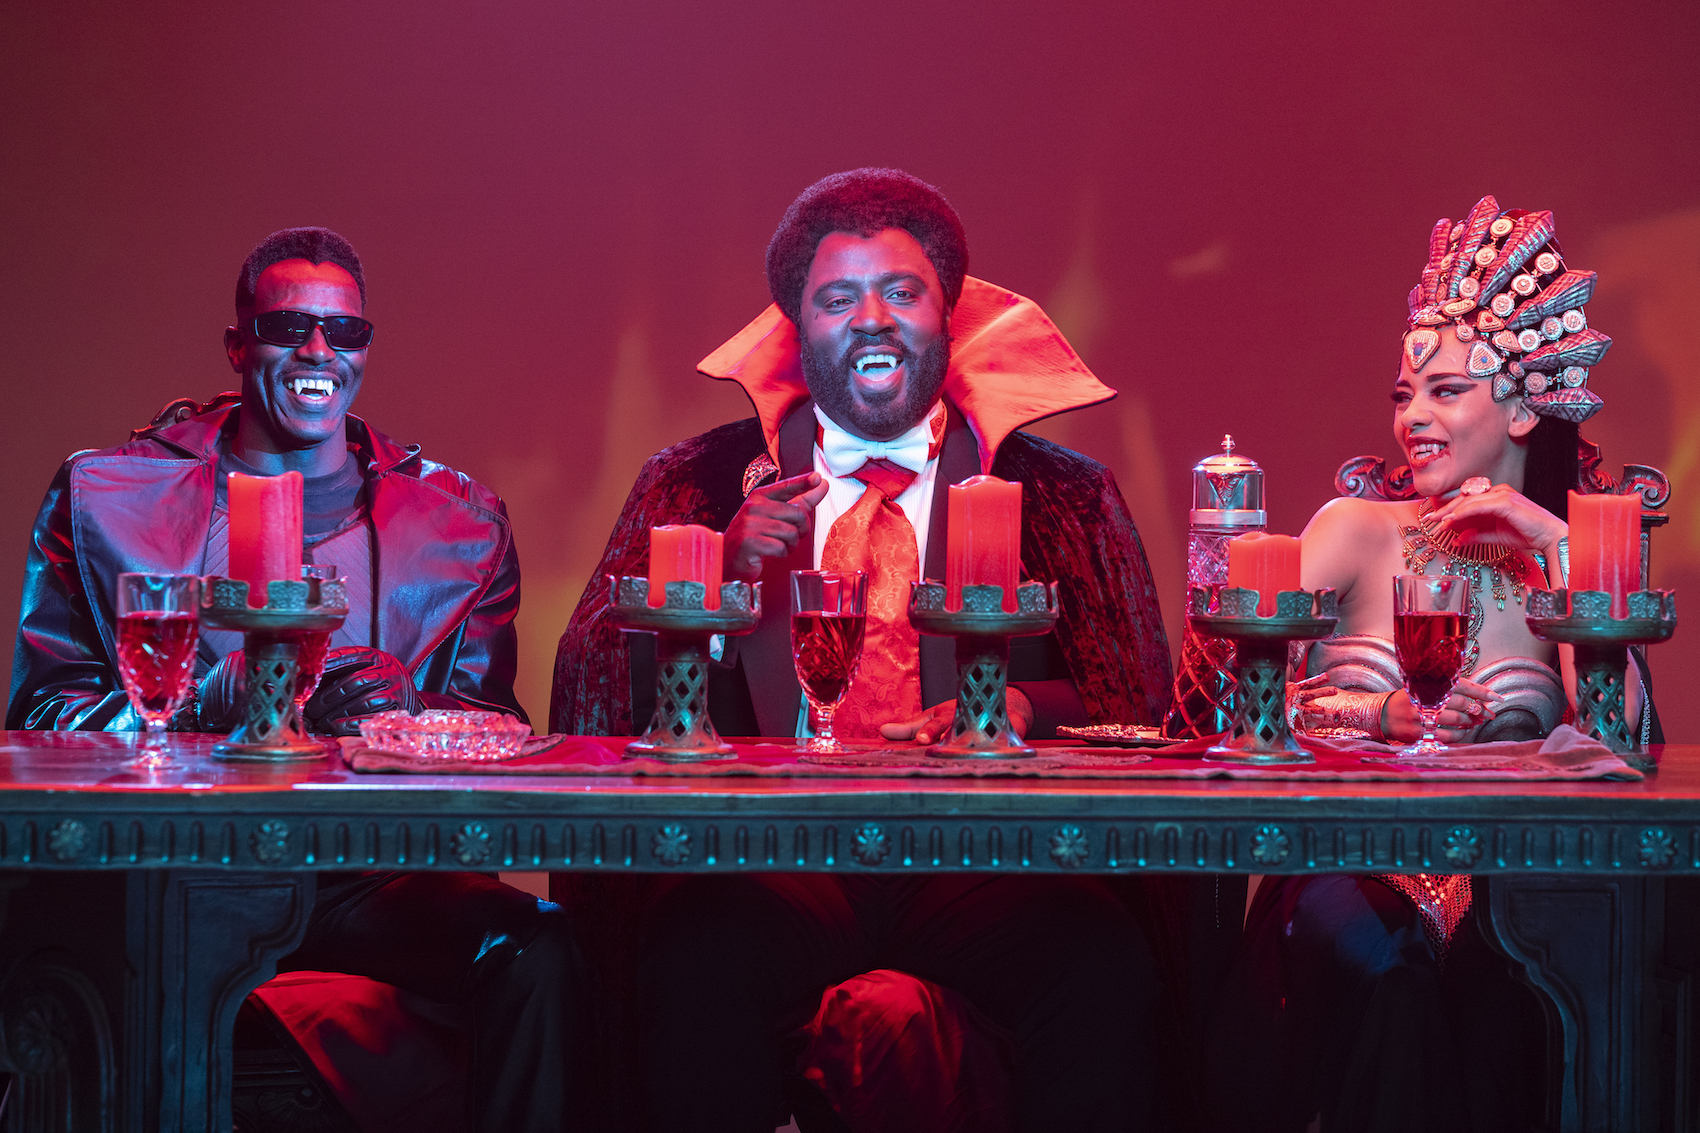 Lanre Idewu as Blade, Bashir Salahuddin as Black Dracula, Jazzma Crofton as Queen Azasha - Sherman's Showcase Spectacular - Photo Credit: Michael Moriatis/IFC